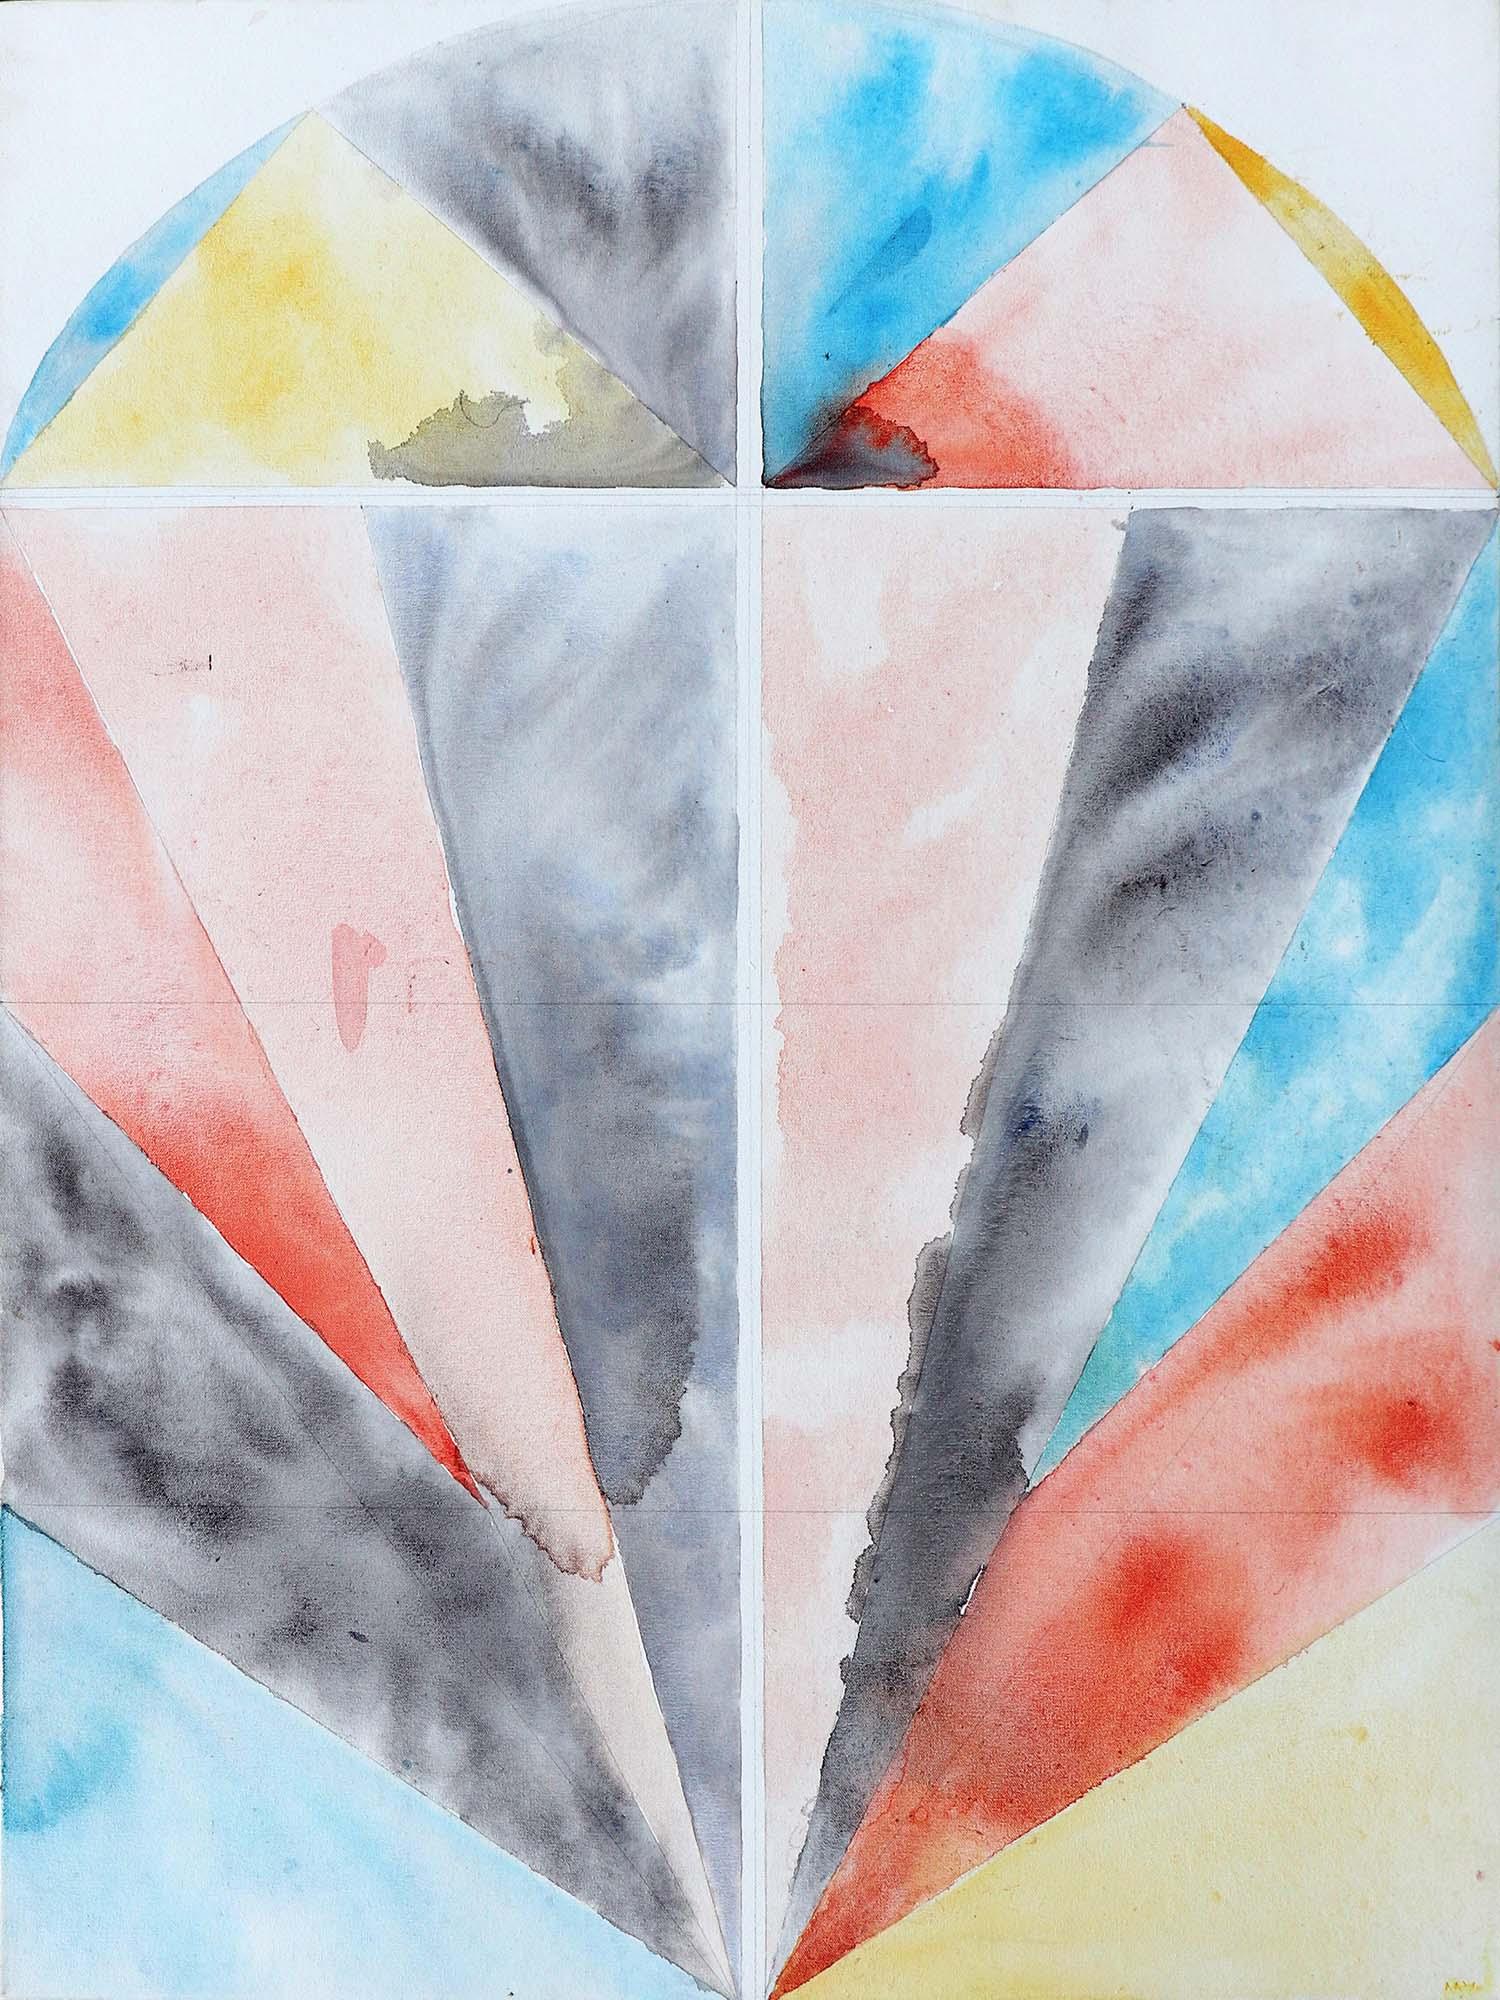 Michaela Vrbkova, Window 2, Acrylic on canvas, 100 x 75 cm, 2017